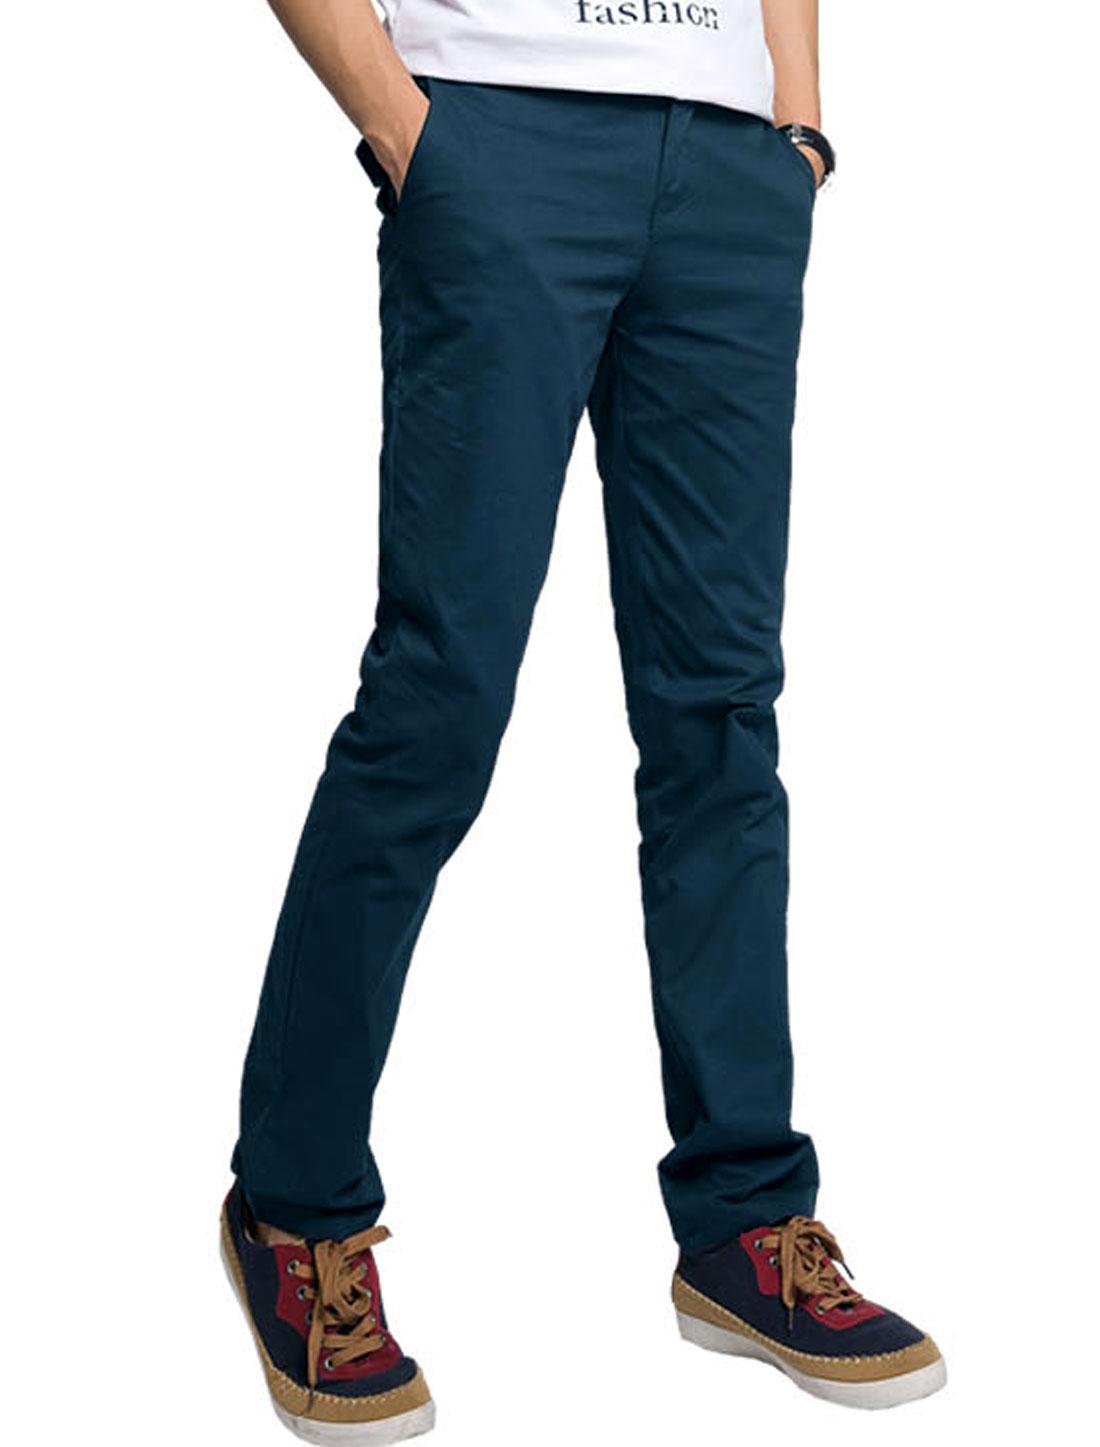 Men Plaids Detail One Hip Pocket Decor Leisure Summer Pants Navy Blue W32